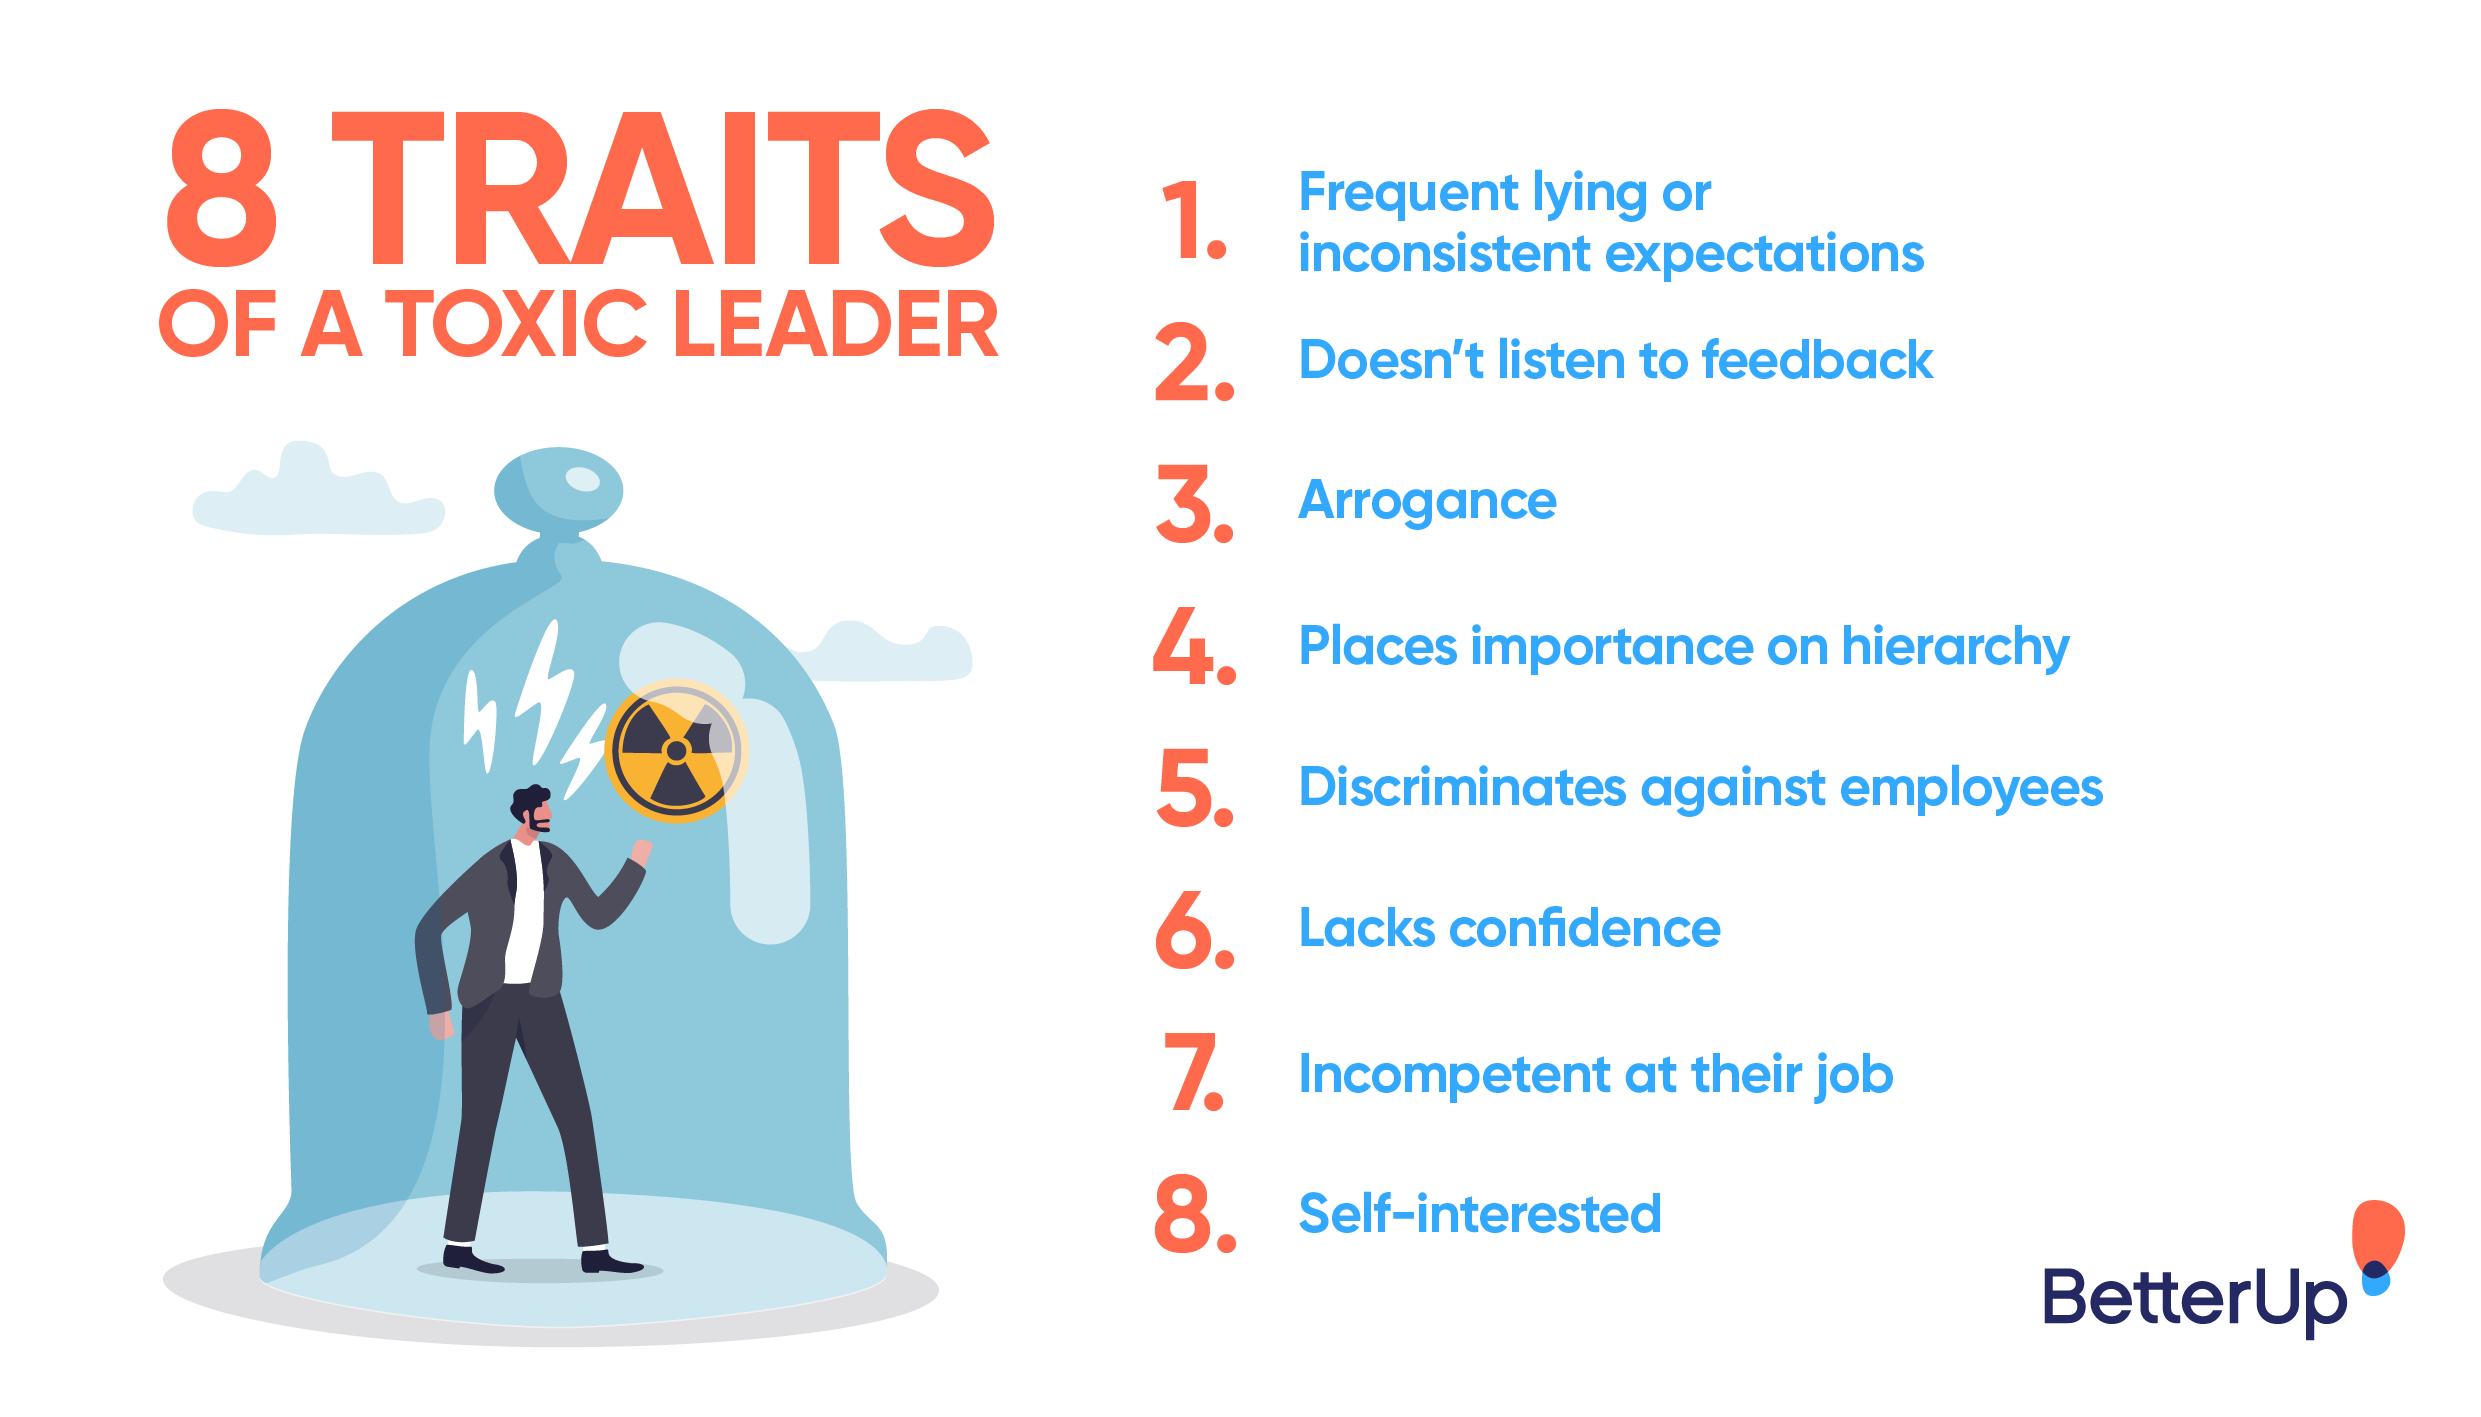 toxic-leader-traits-toxic-leadership